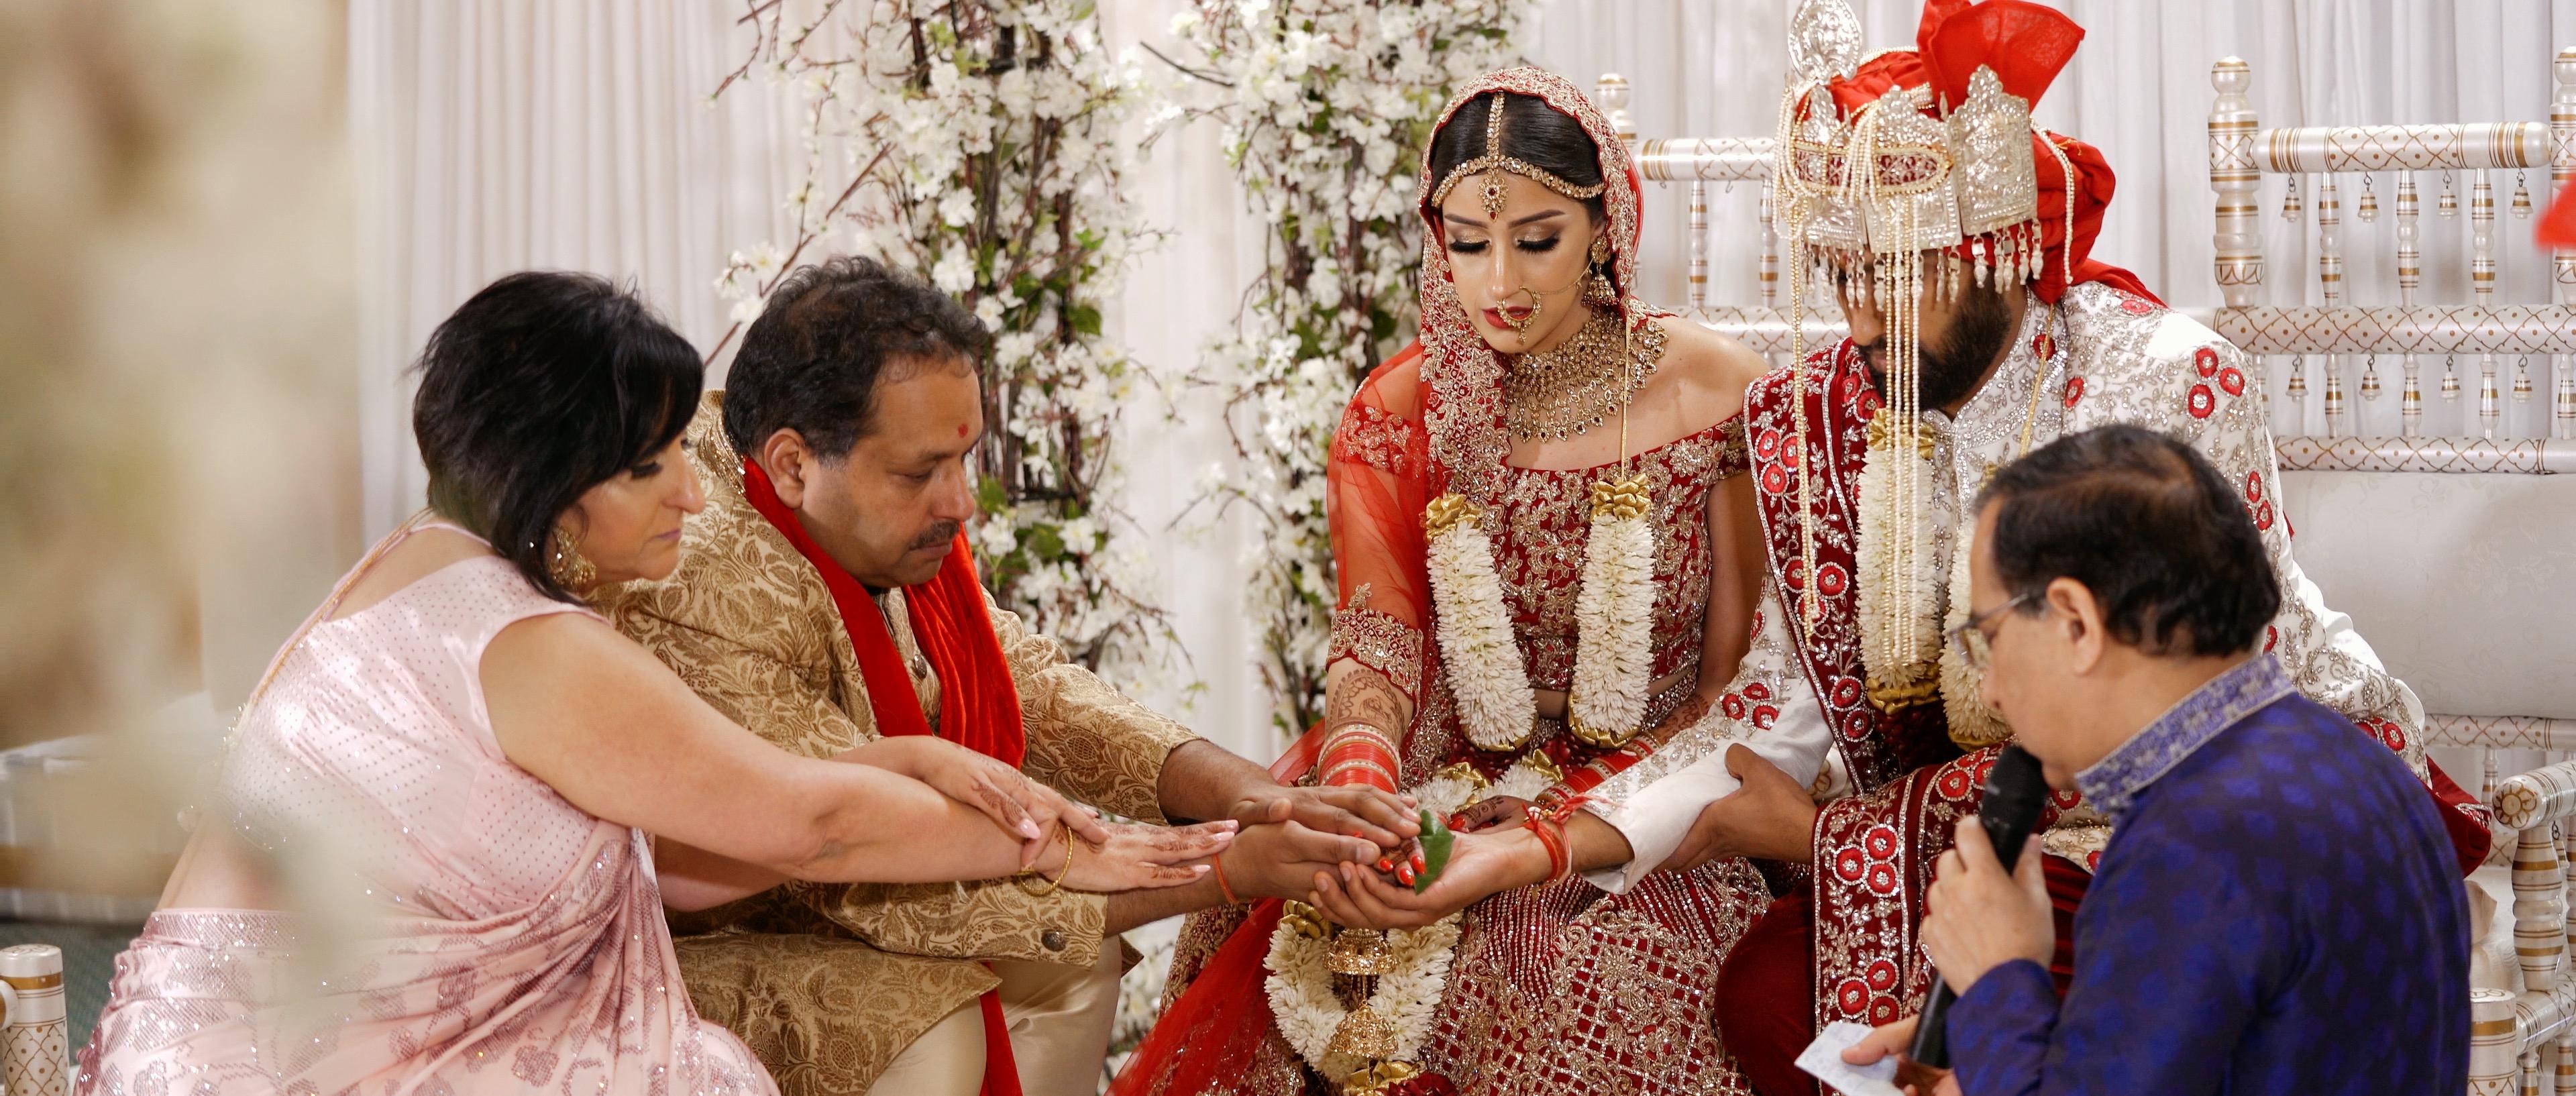 indian wedding ceremony chateau impney